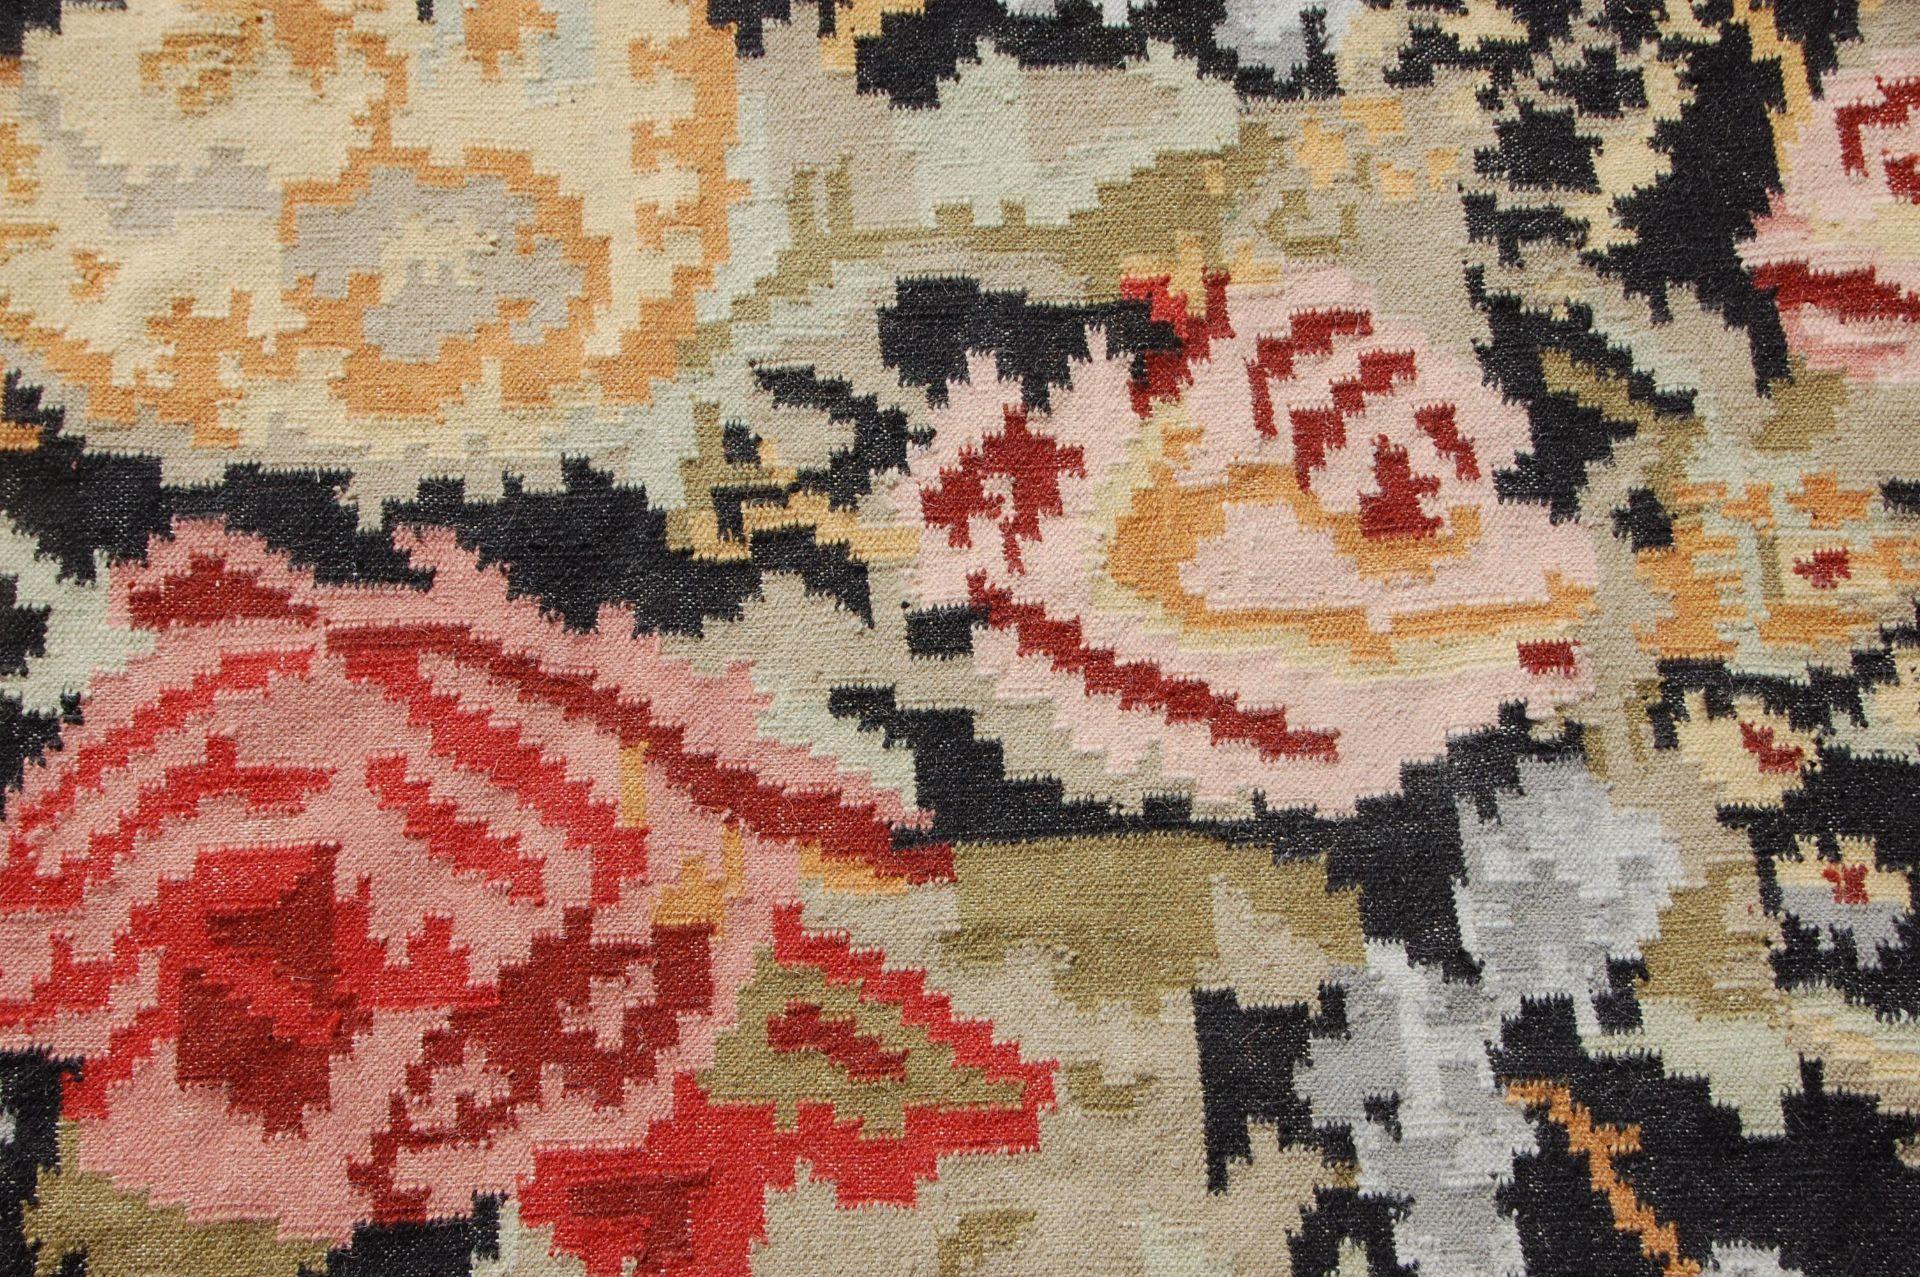 Los 1392 - An early 20th Century Chinese floor rug having bla